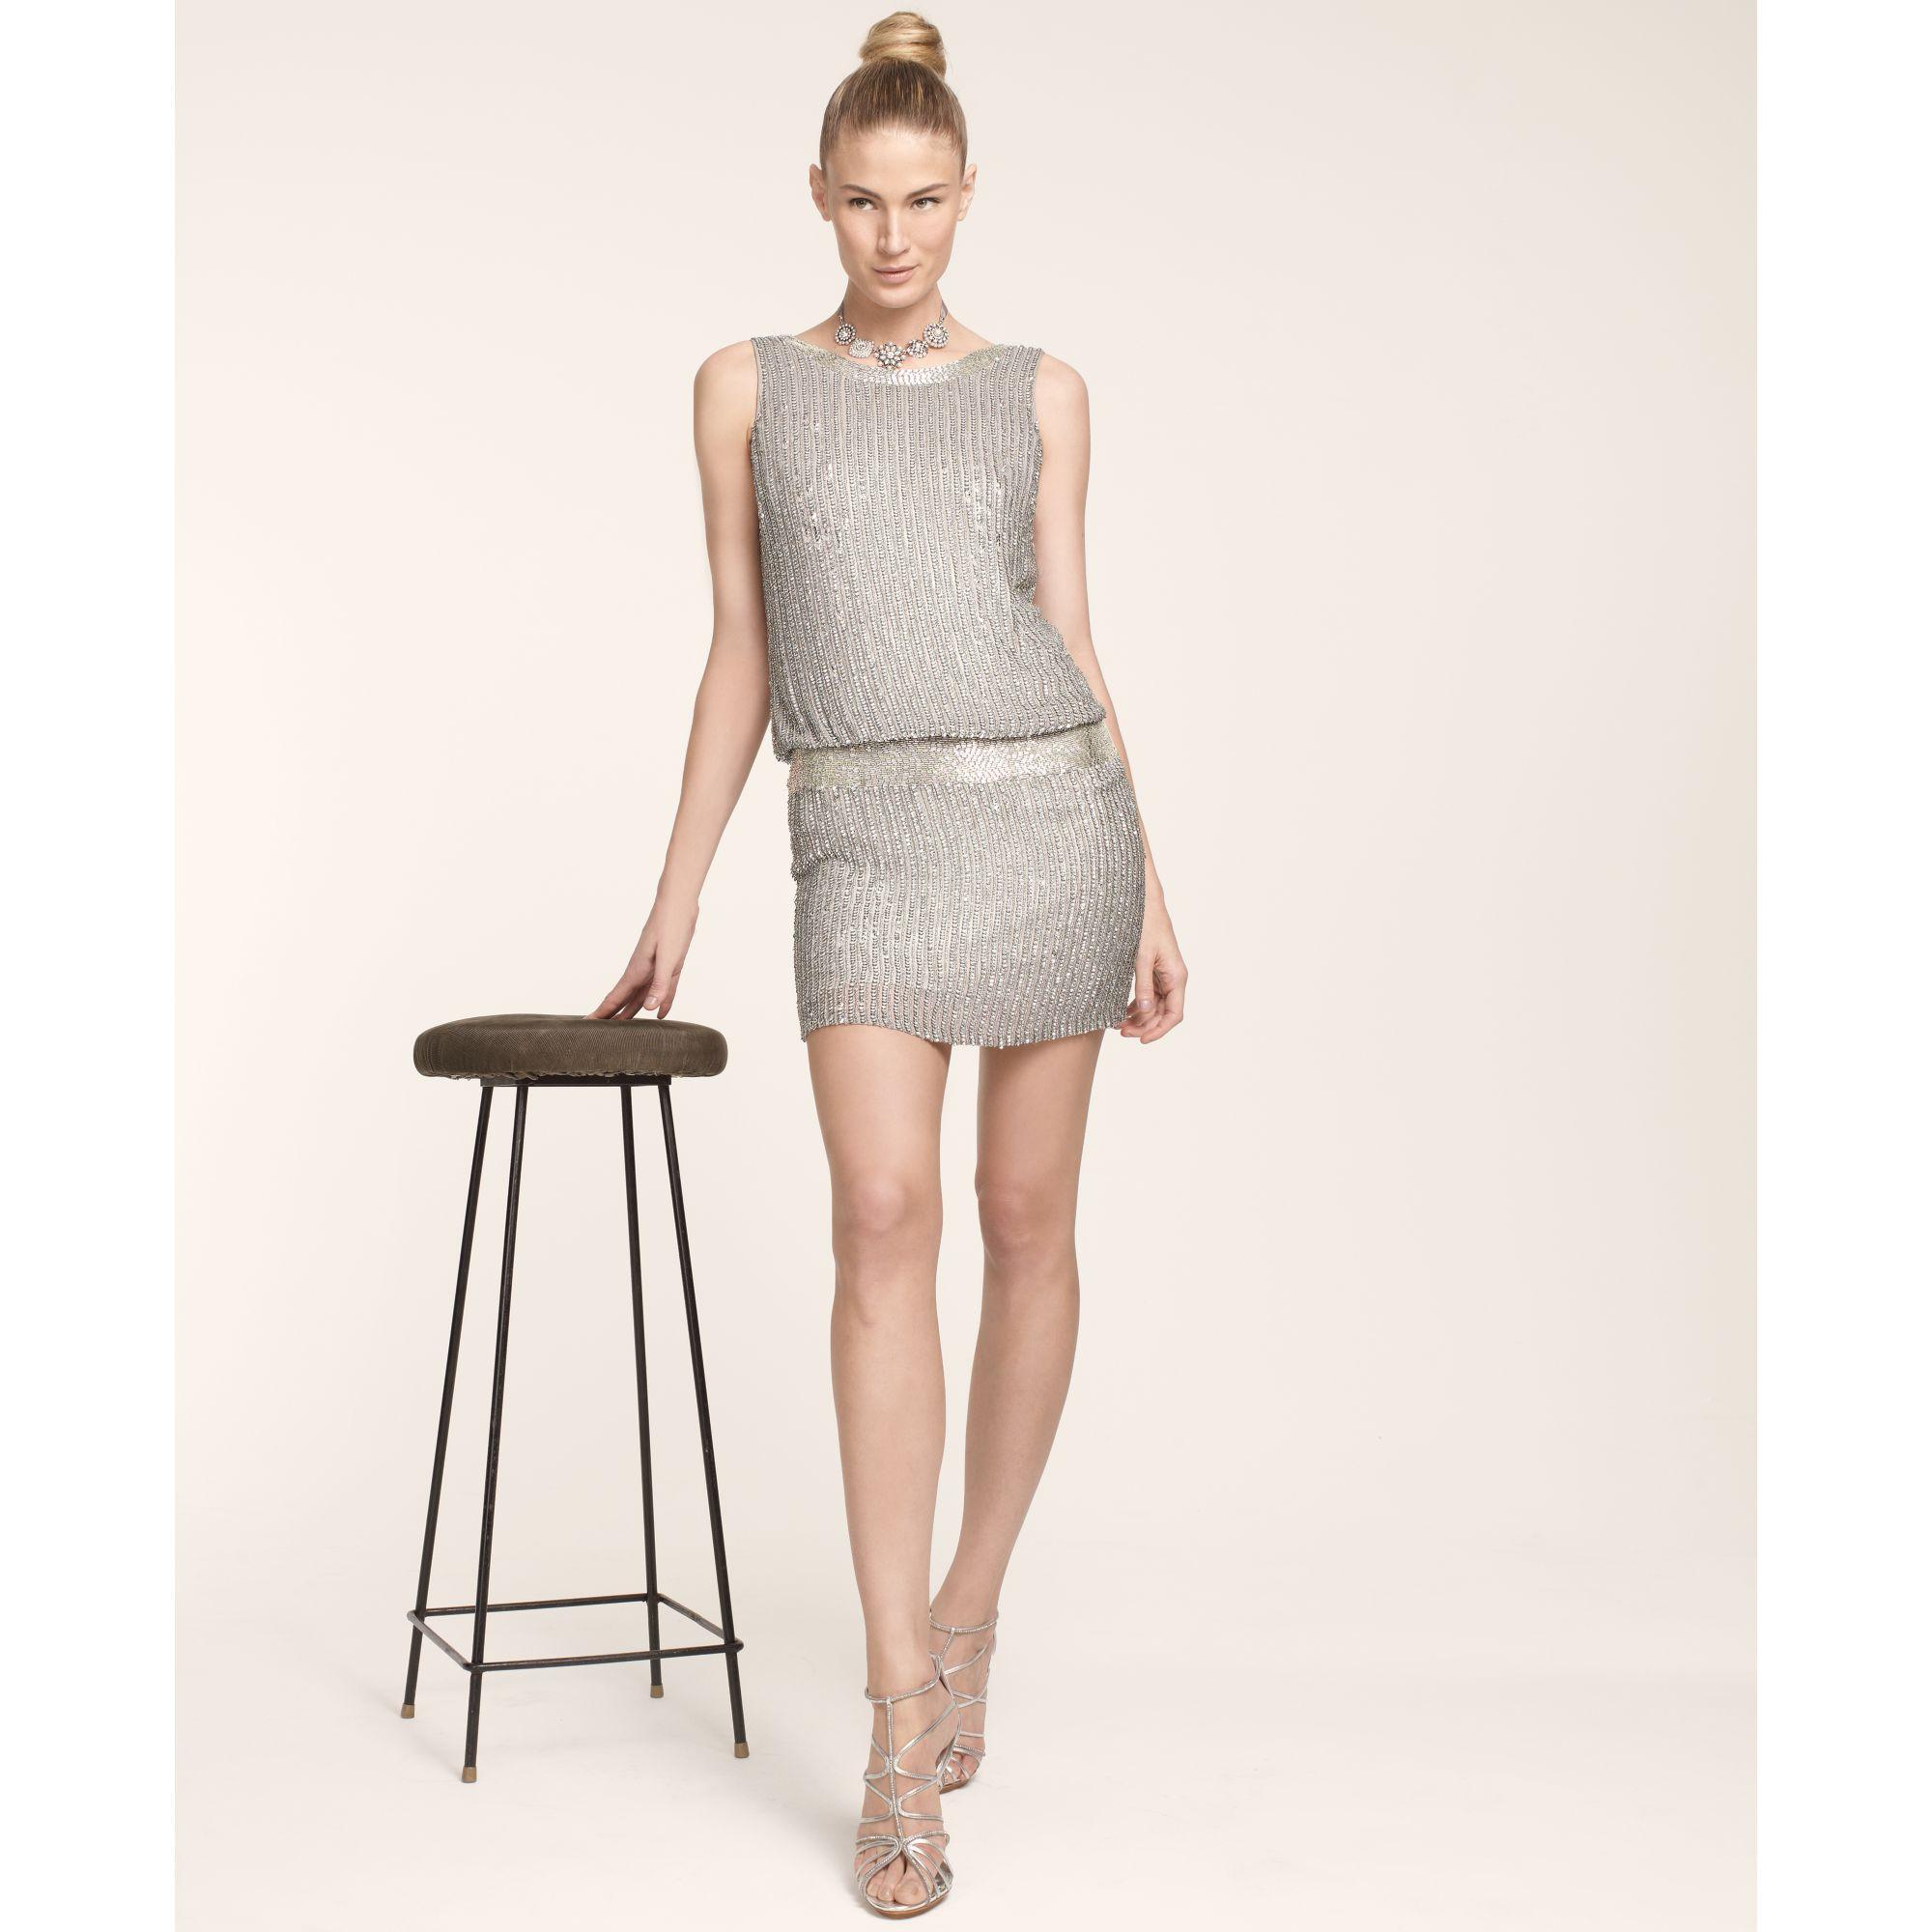 Lyst - Adrianna Papell Sleeveless Beaded Blouson Dress in Gray